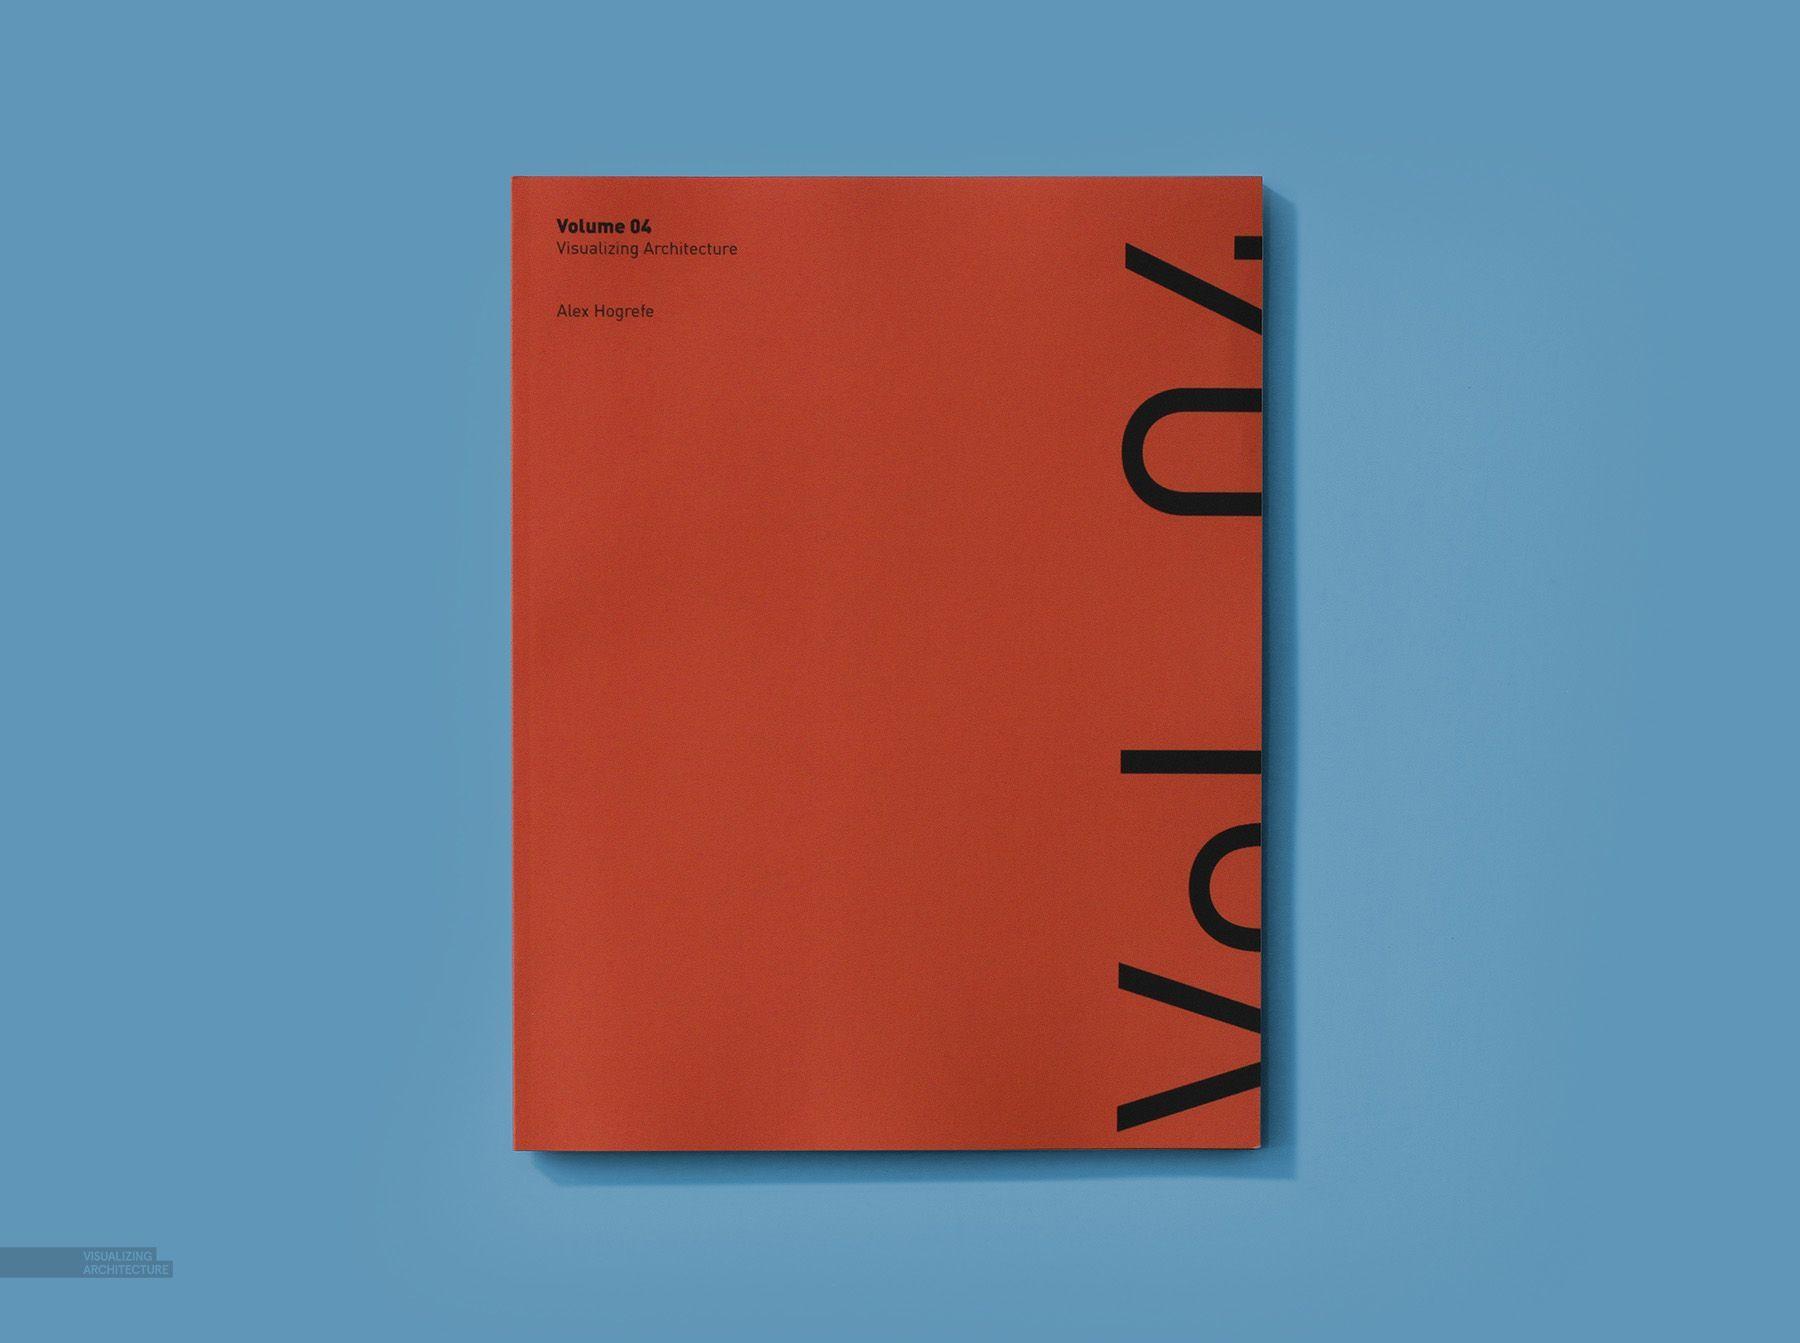 Portfolio Volume 4 | Visualizing Architecture -  Portfolio Volume 4 | Visualizing Architecture  - #abstractmodelarchitecture #architecturallandscape #architecturalportfoliocoverpage #architecture #portfolio #visualizing #volume